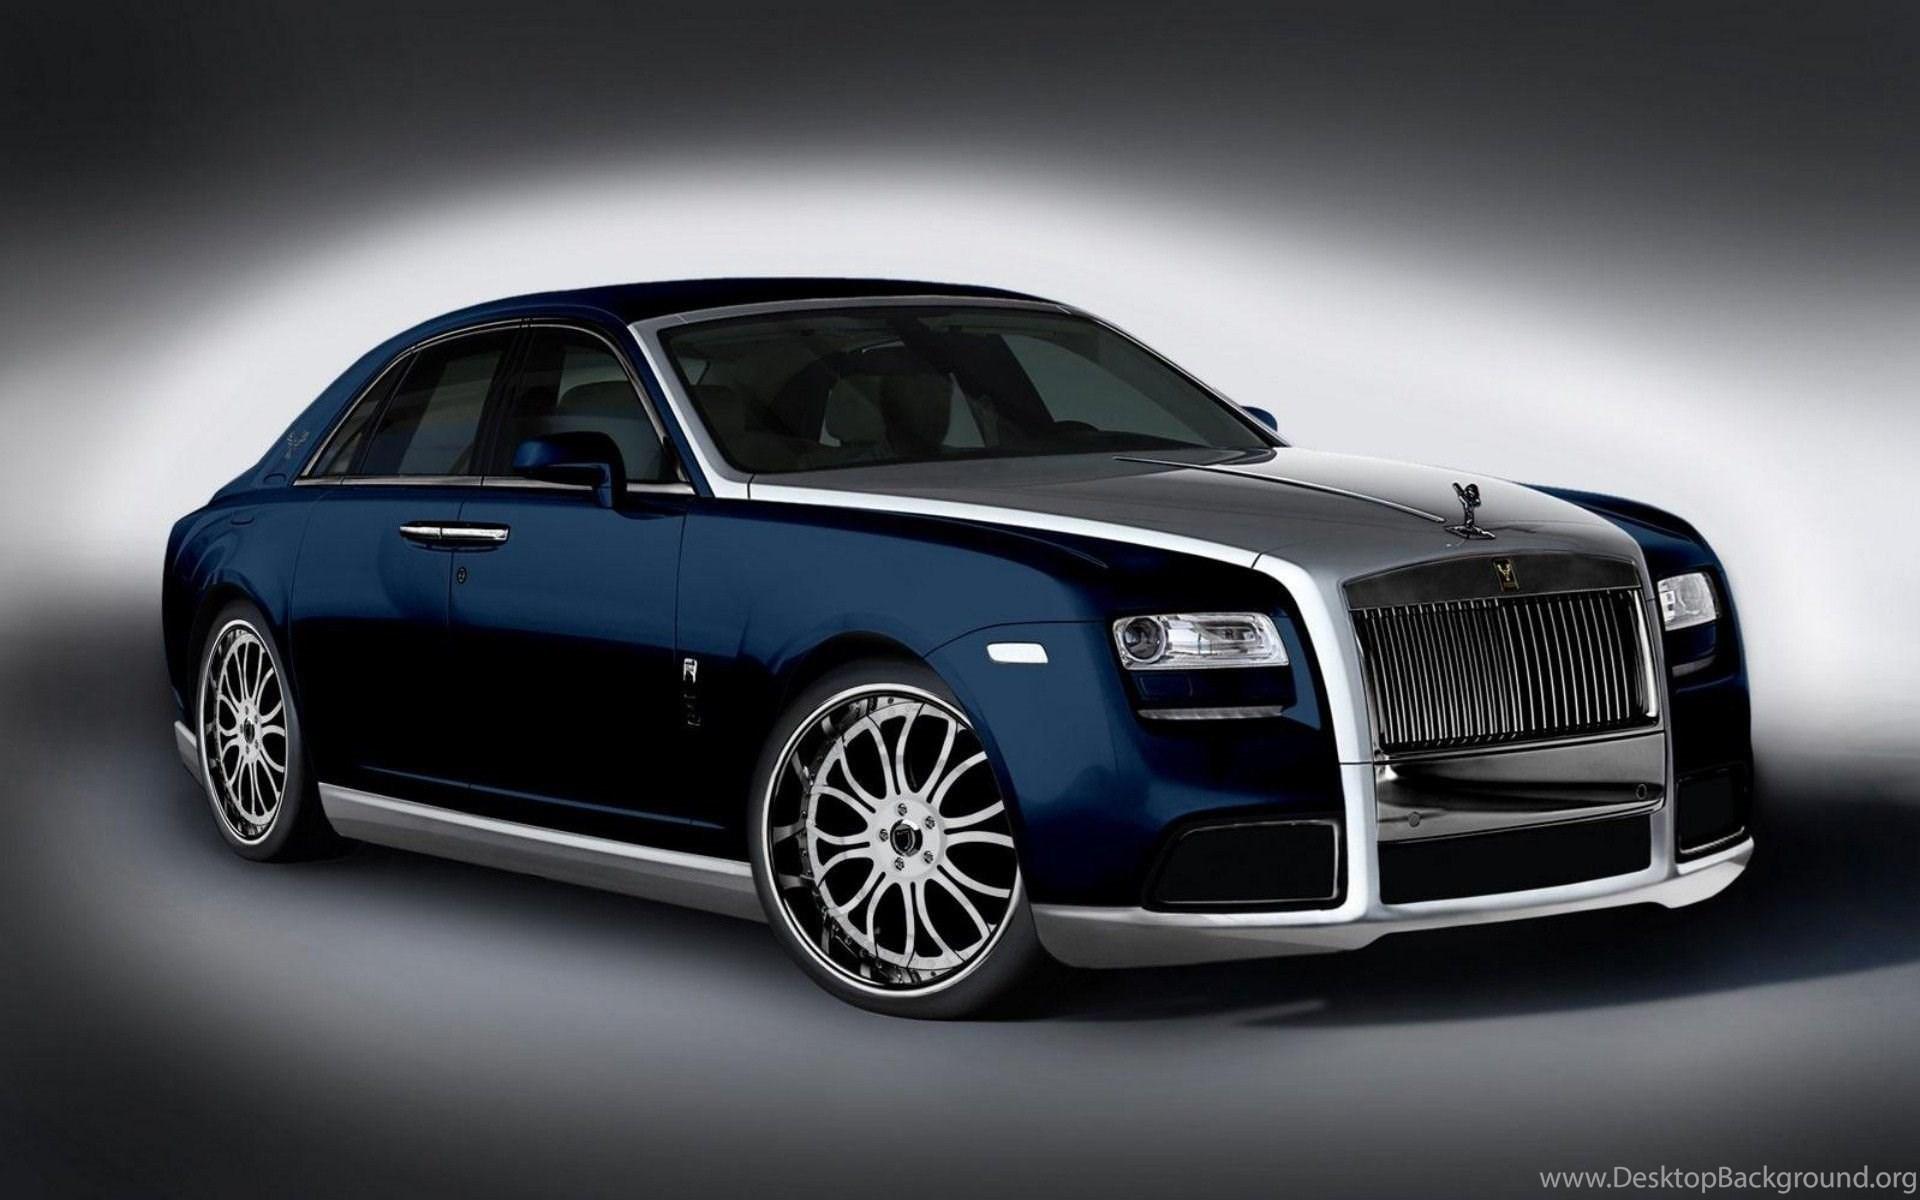 Rolls royce cars wallpapers widescreen hd wallpapers - Rolls royce wallpaper download ...